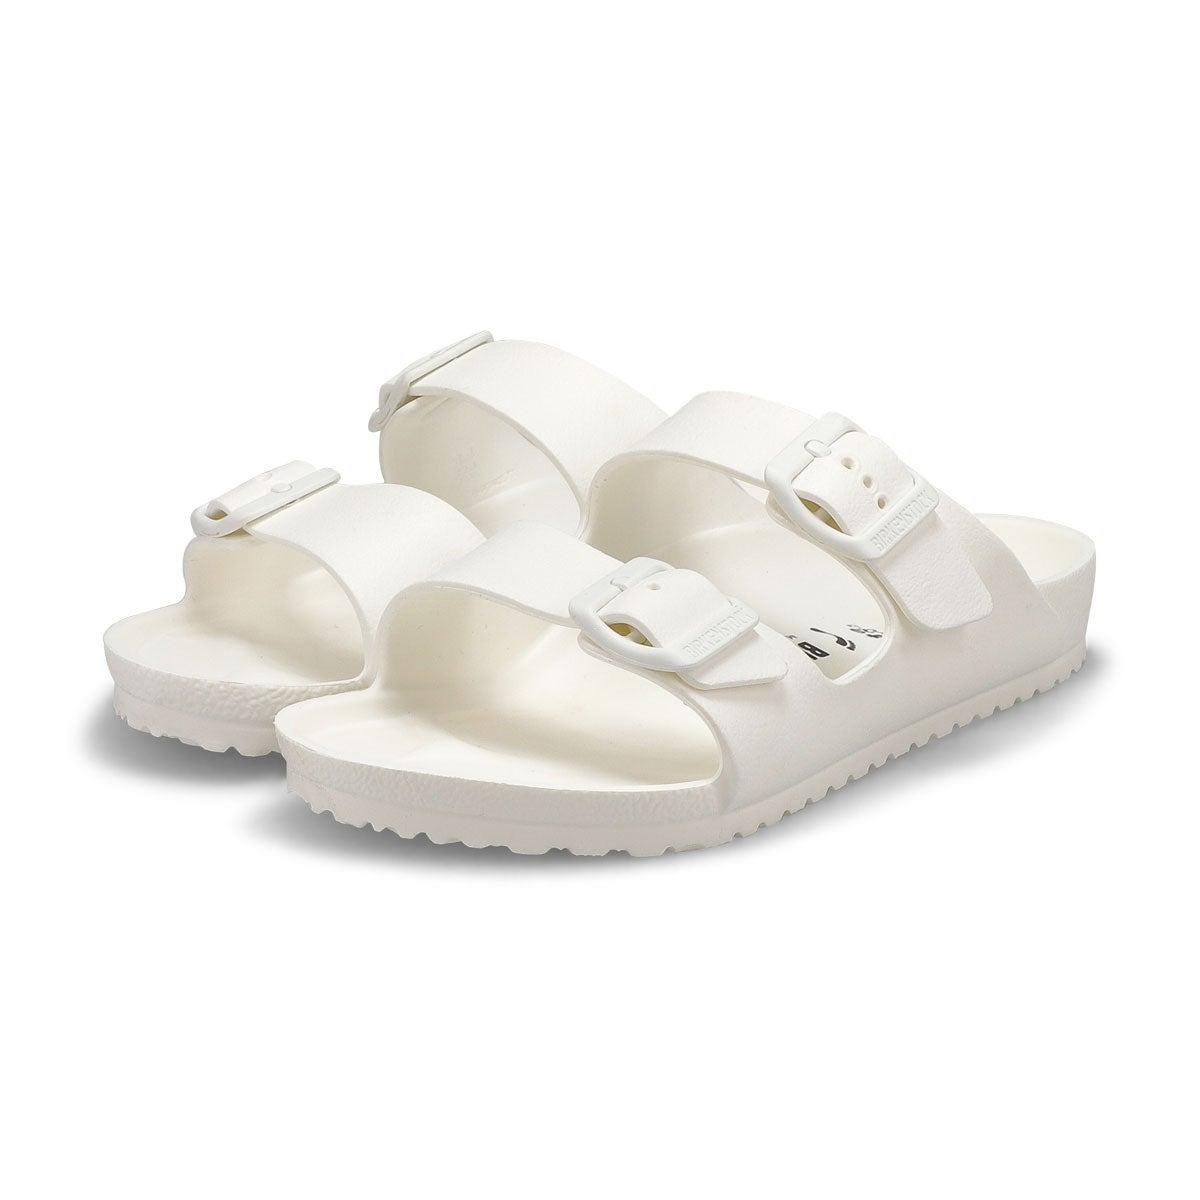 Kids' Arizona EVA narrow sandal - white